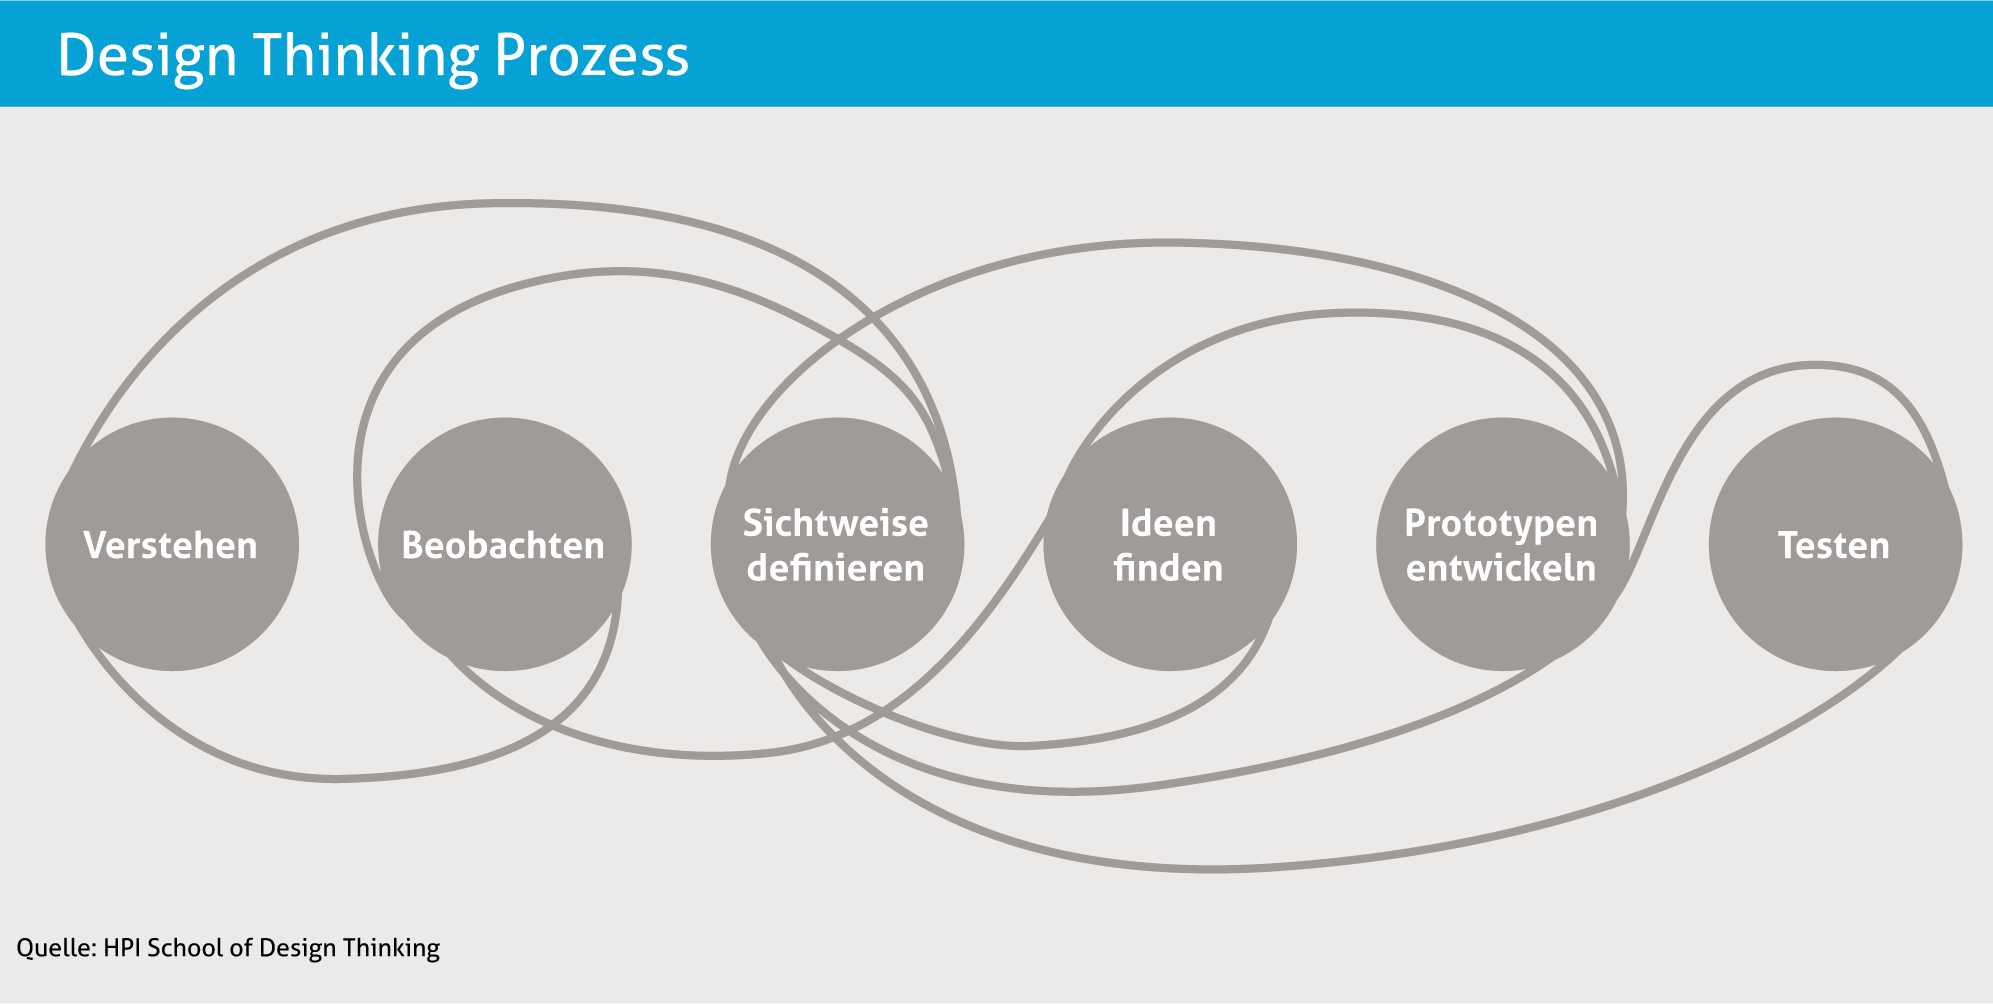 Smart Service Design als iterativer Prozess